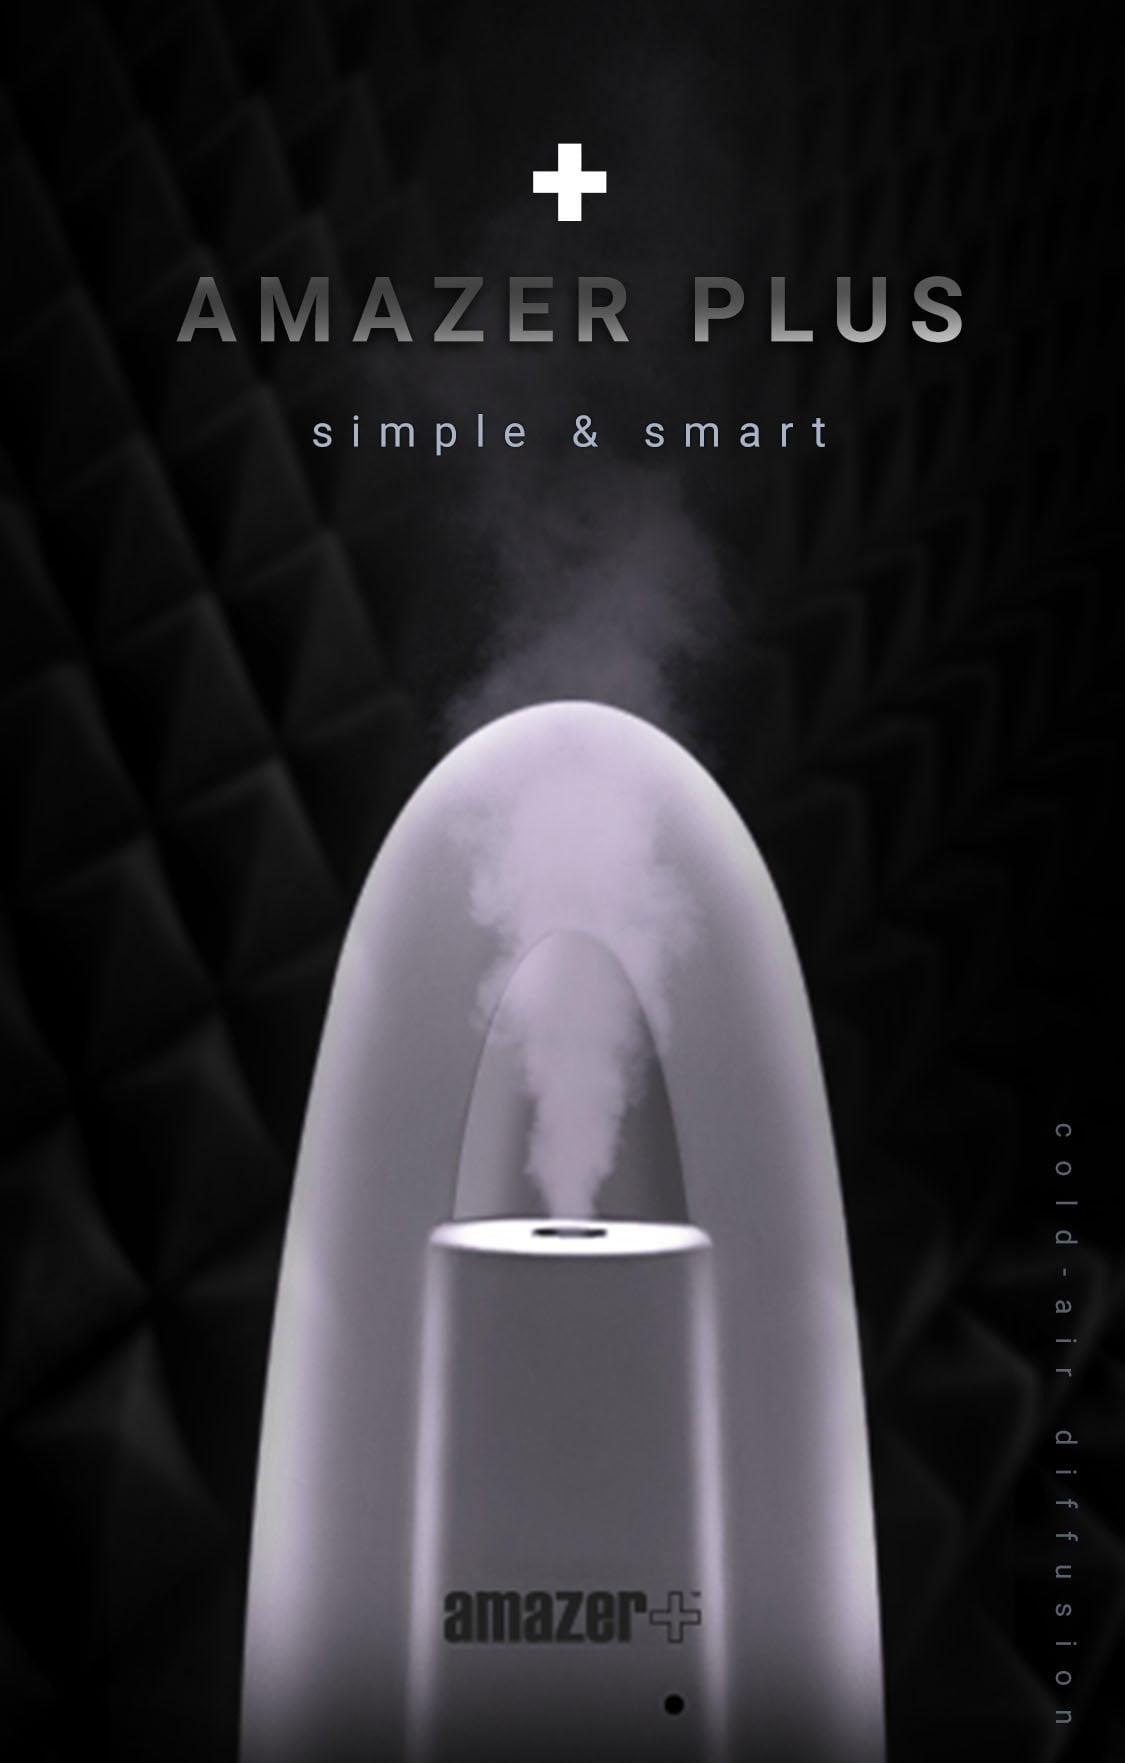 Amazer Plus Fragrance Diffuser Image